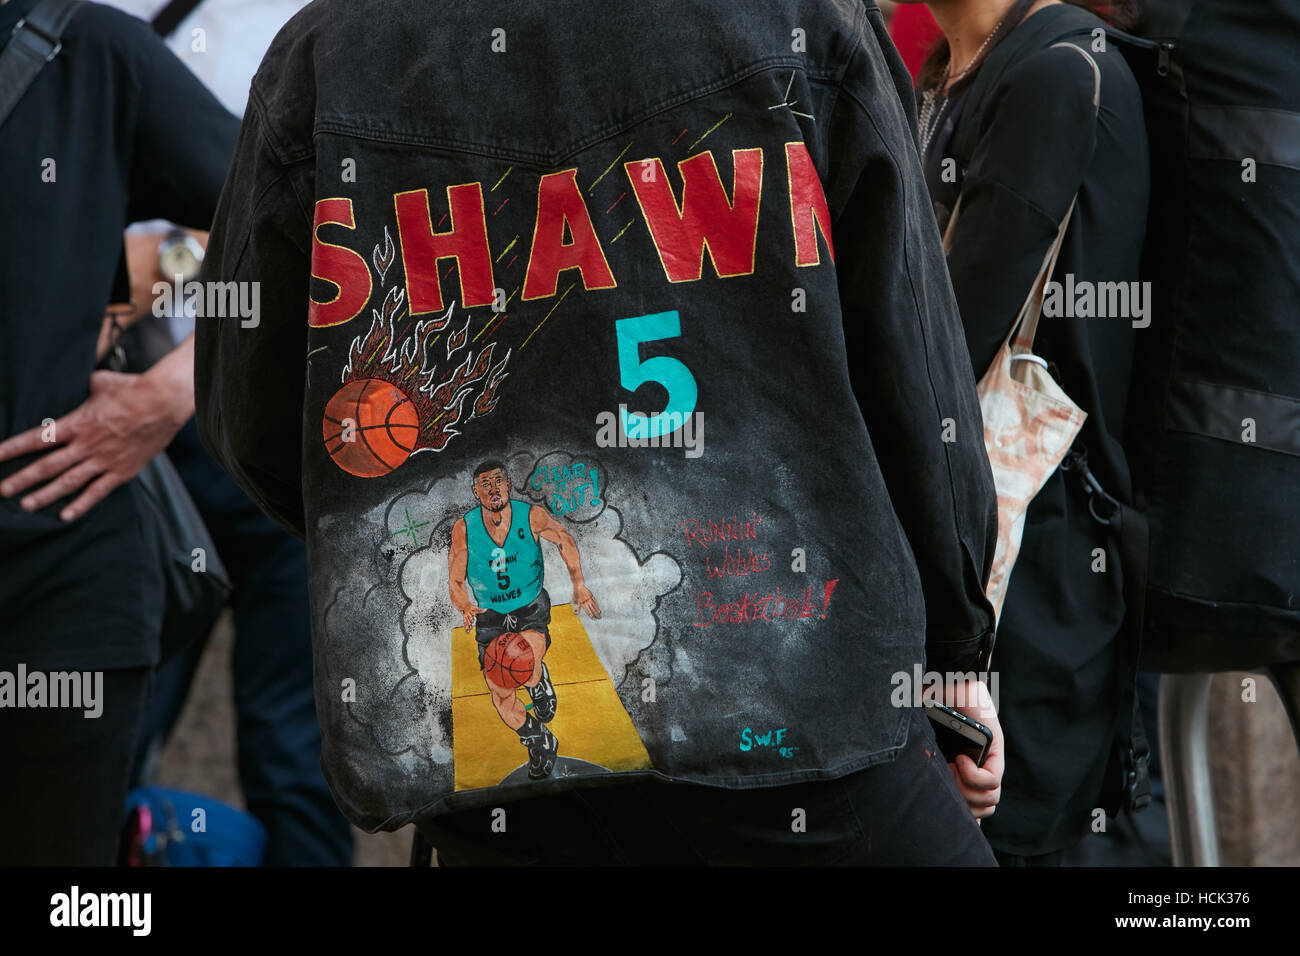 Man with black jacket with basket ball player before Salvatore Ferragamo fashion show, Milan Fashion Week street Stock Photo